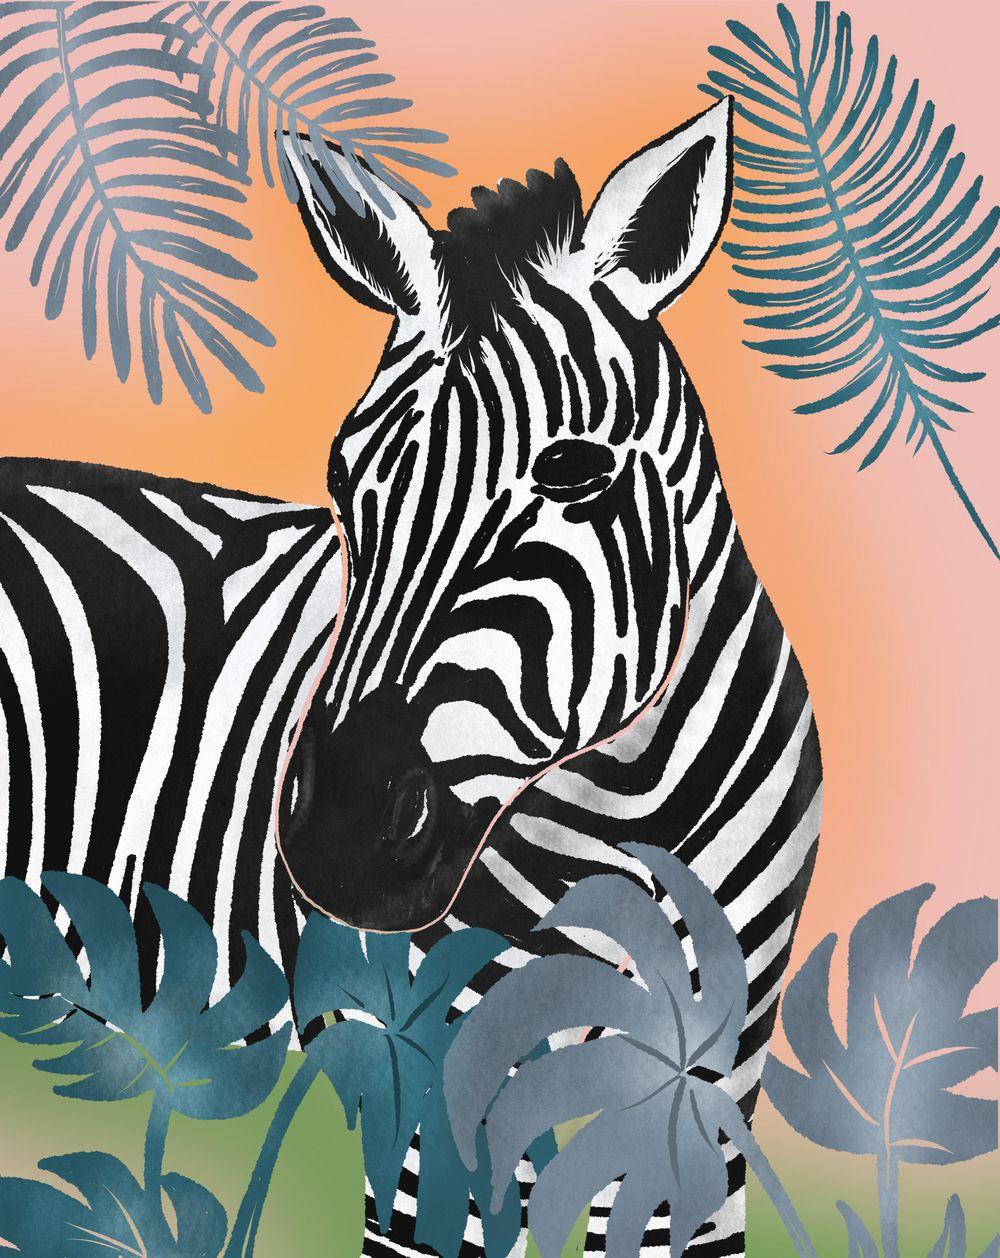 My zebra - image 1 - student project